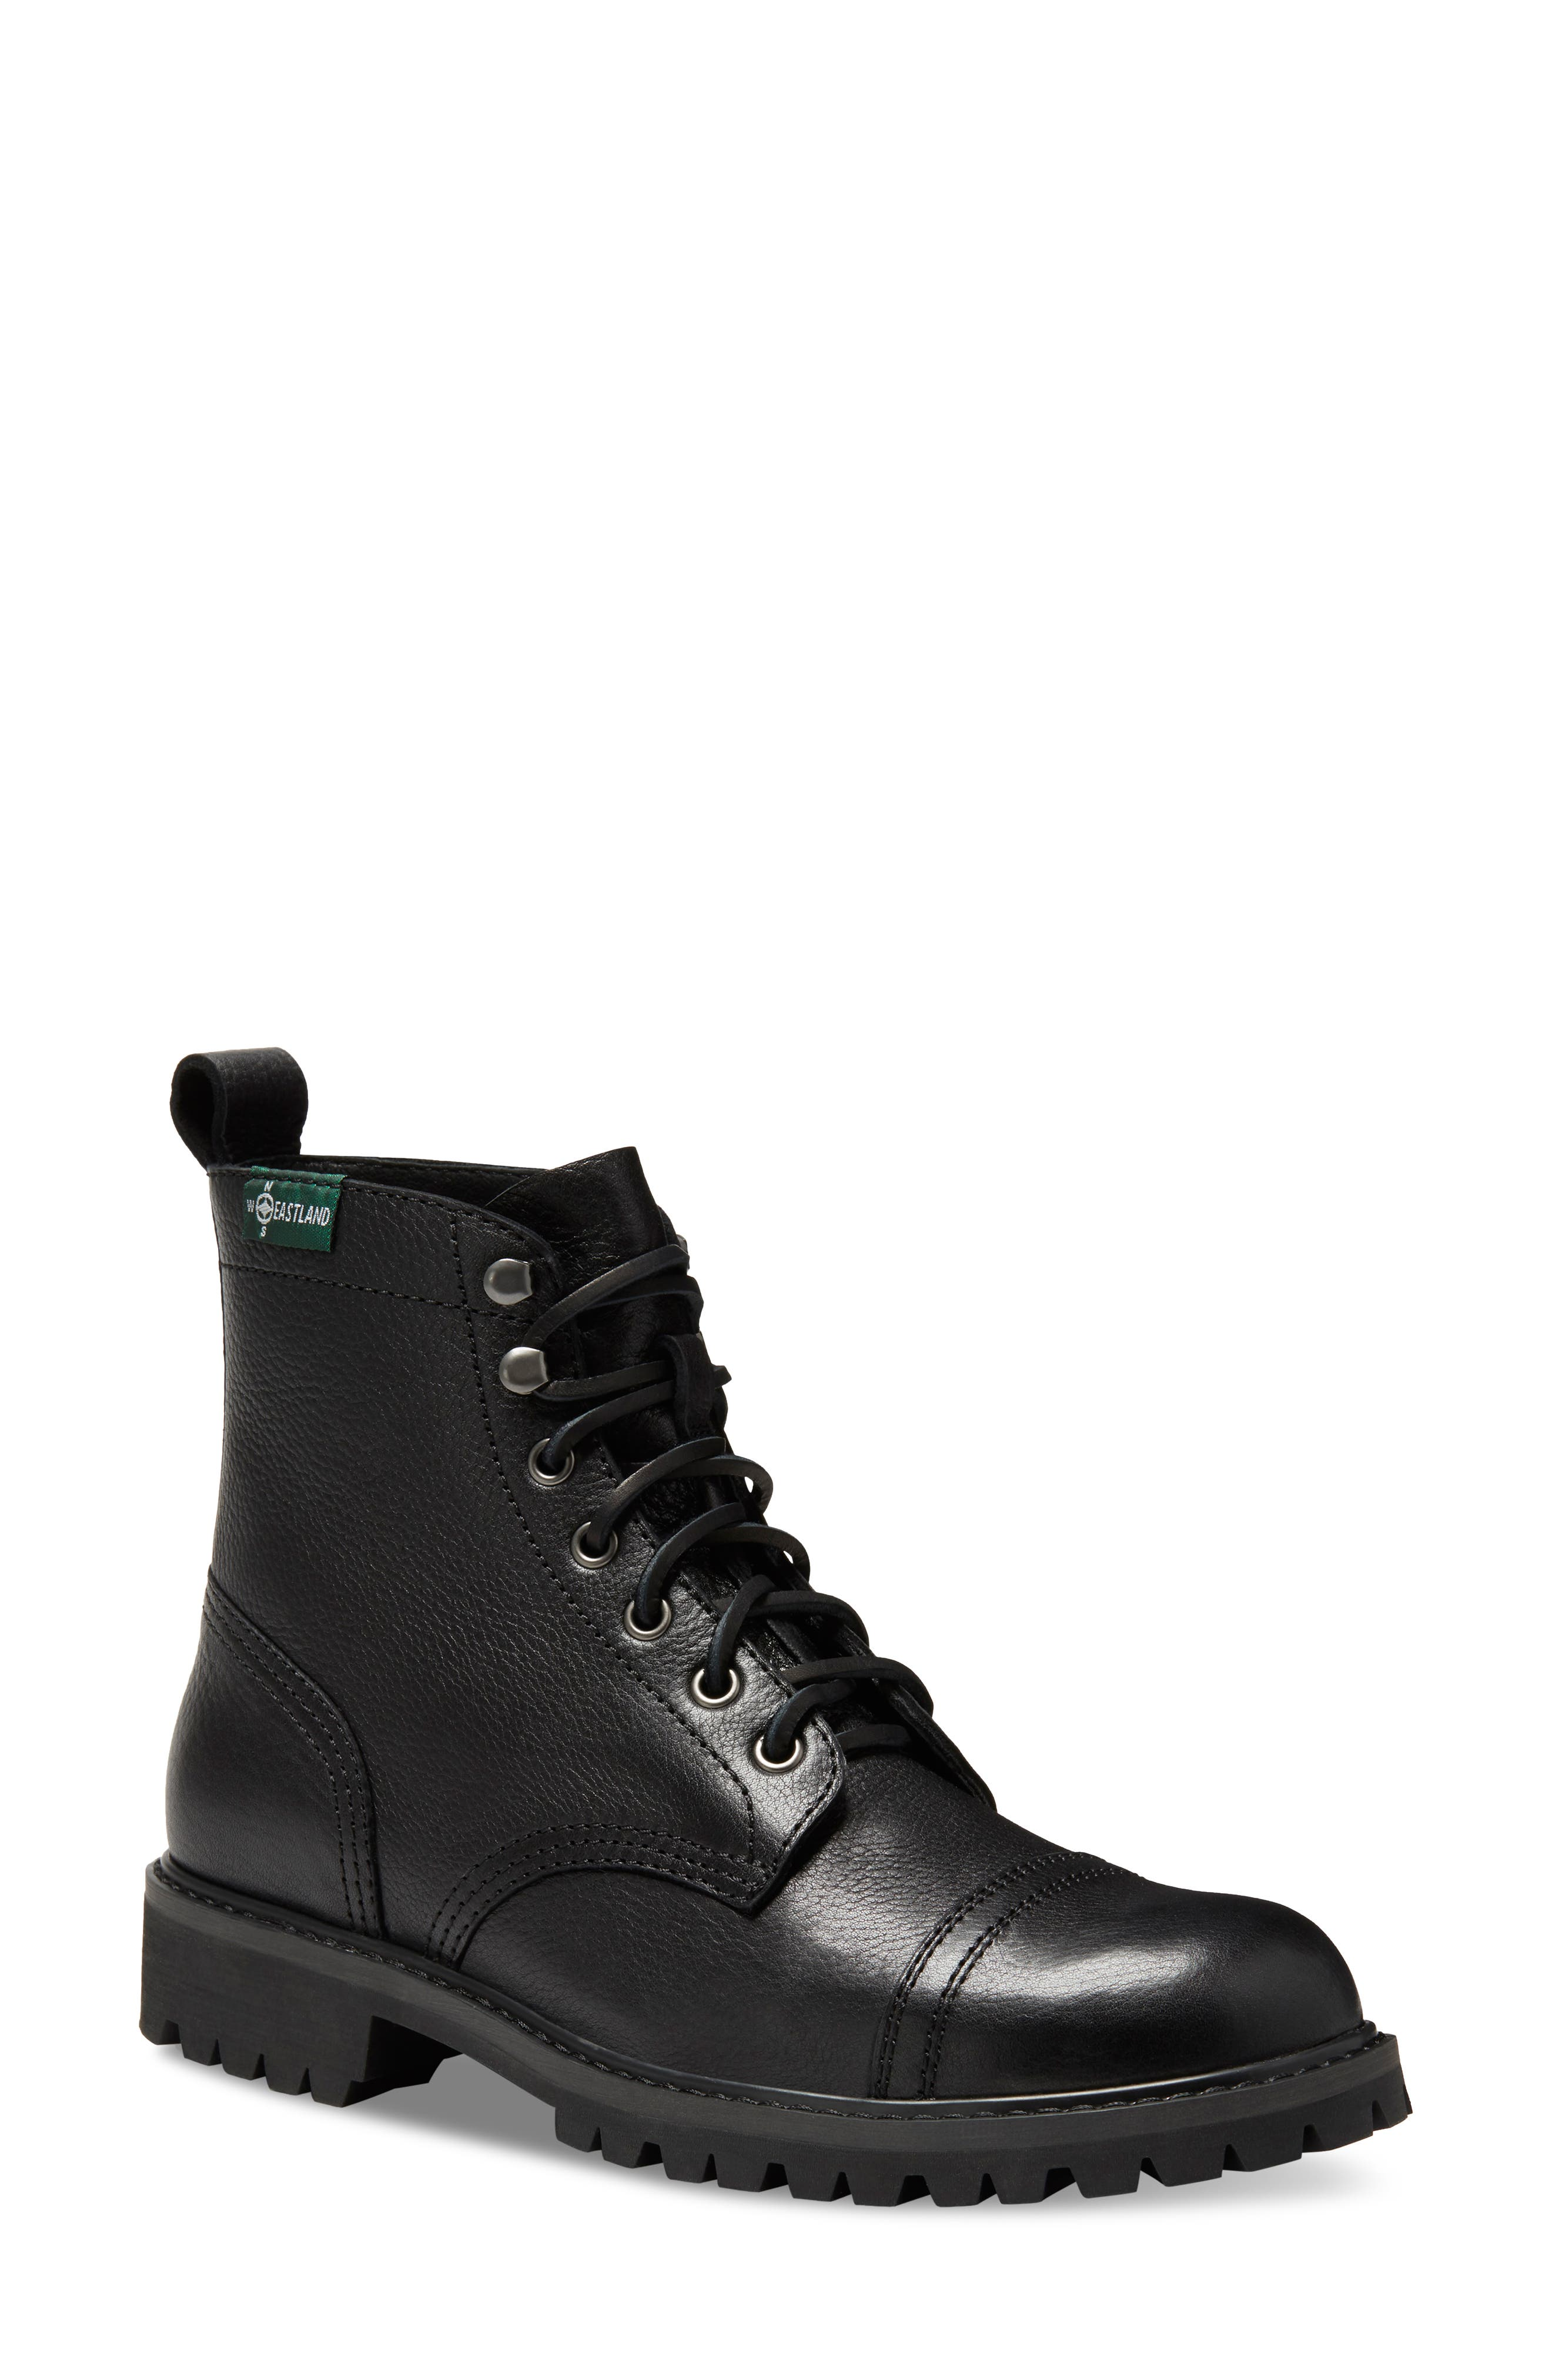 Ethan 1955 Cap Toe Boot